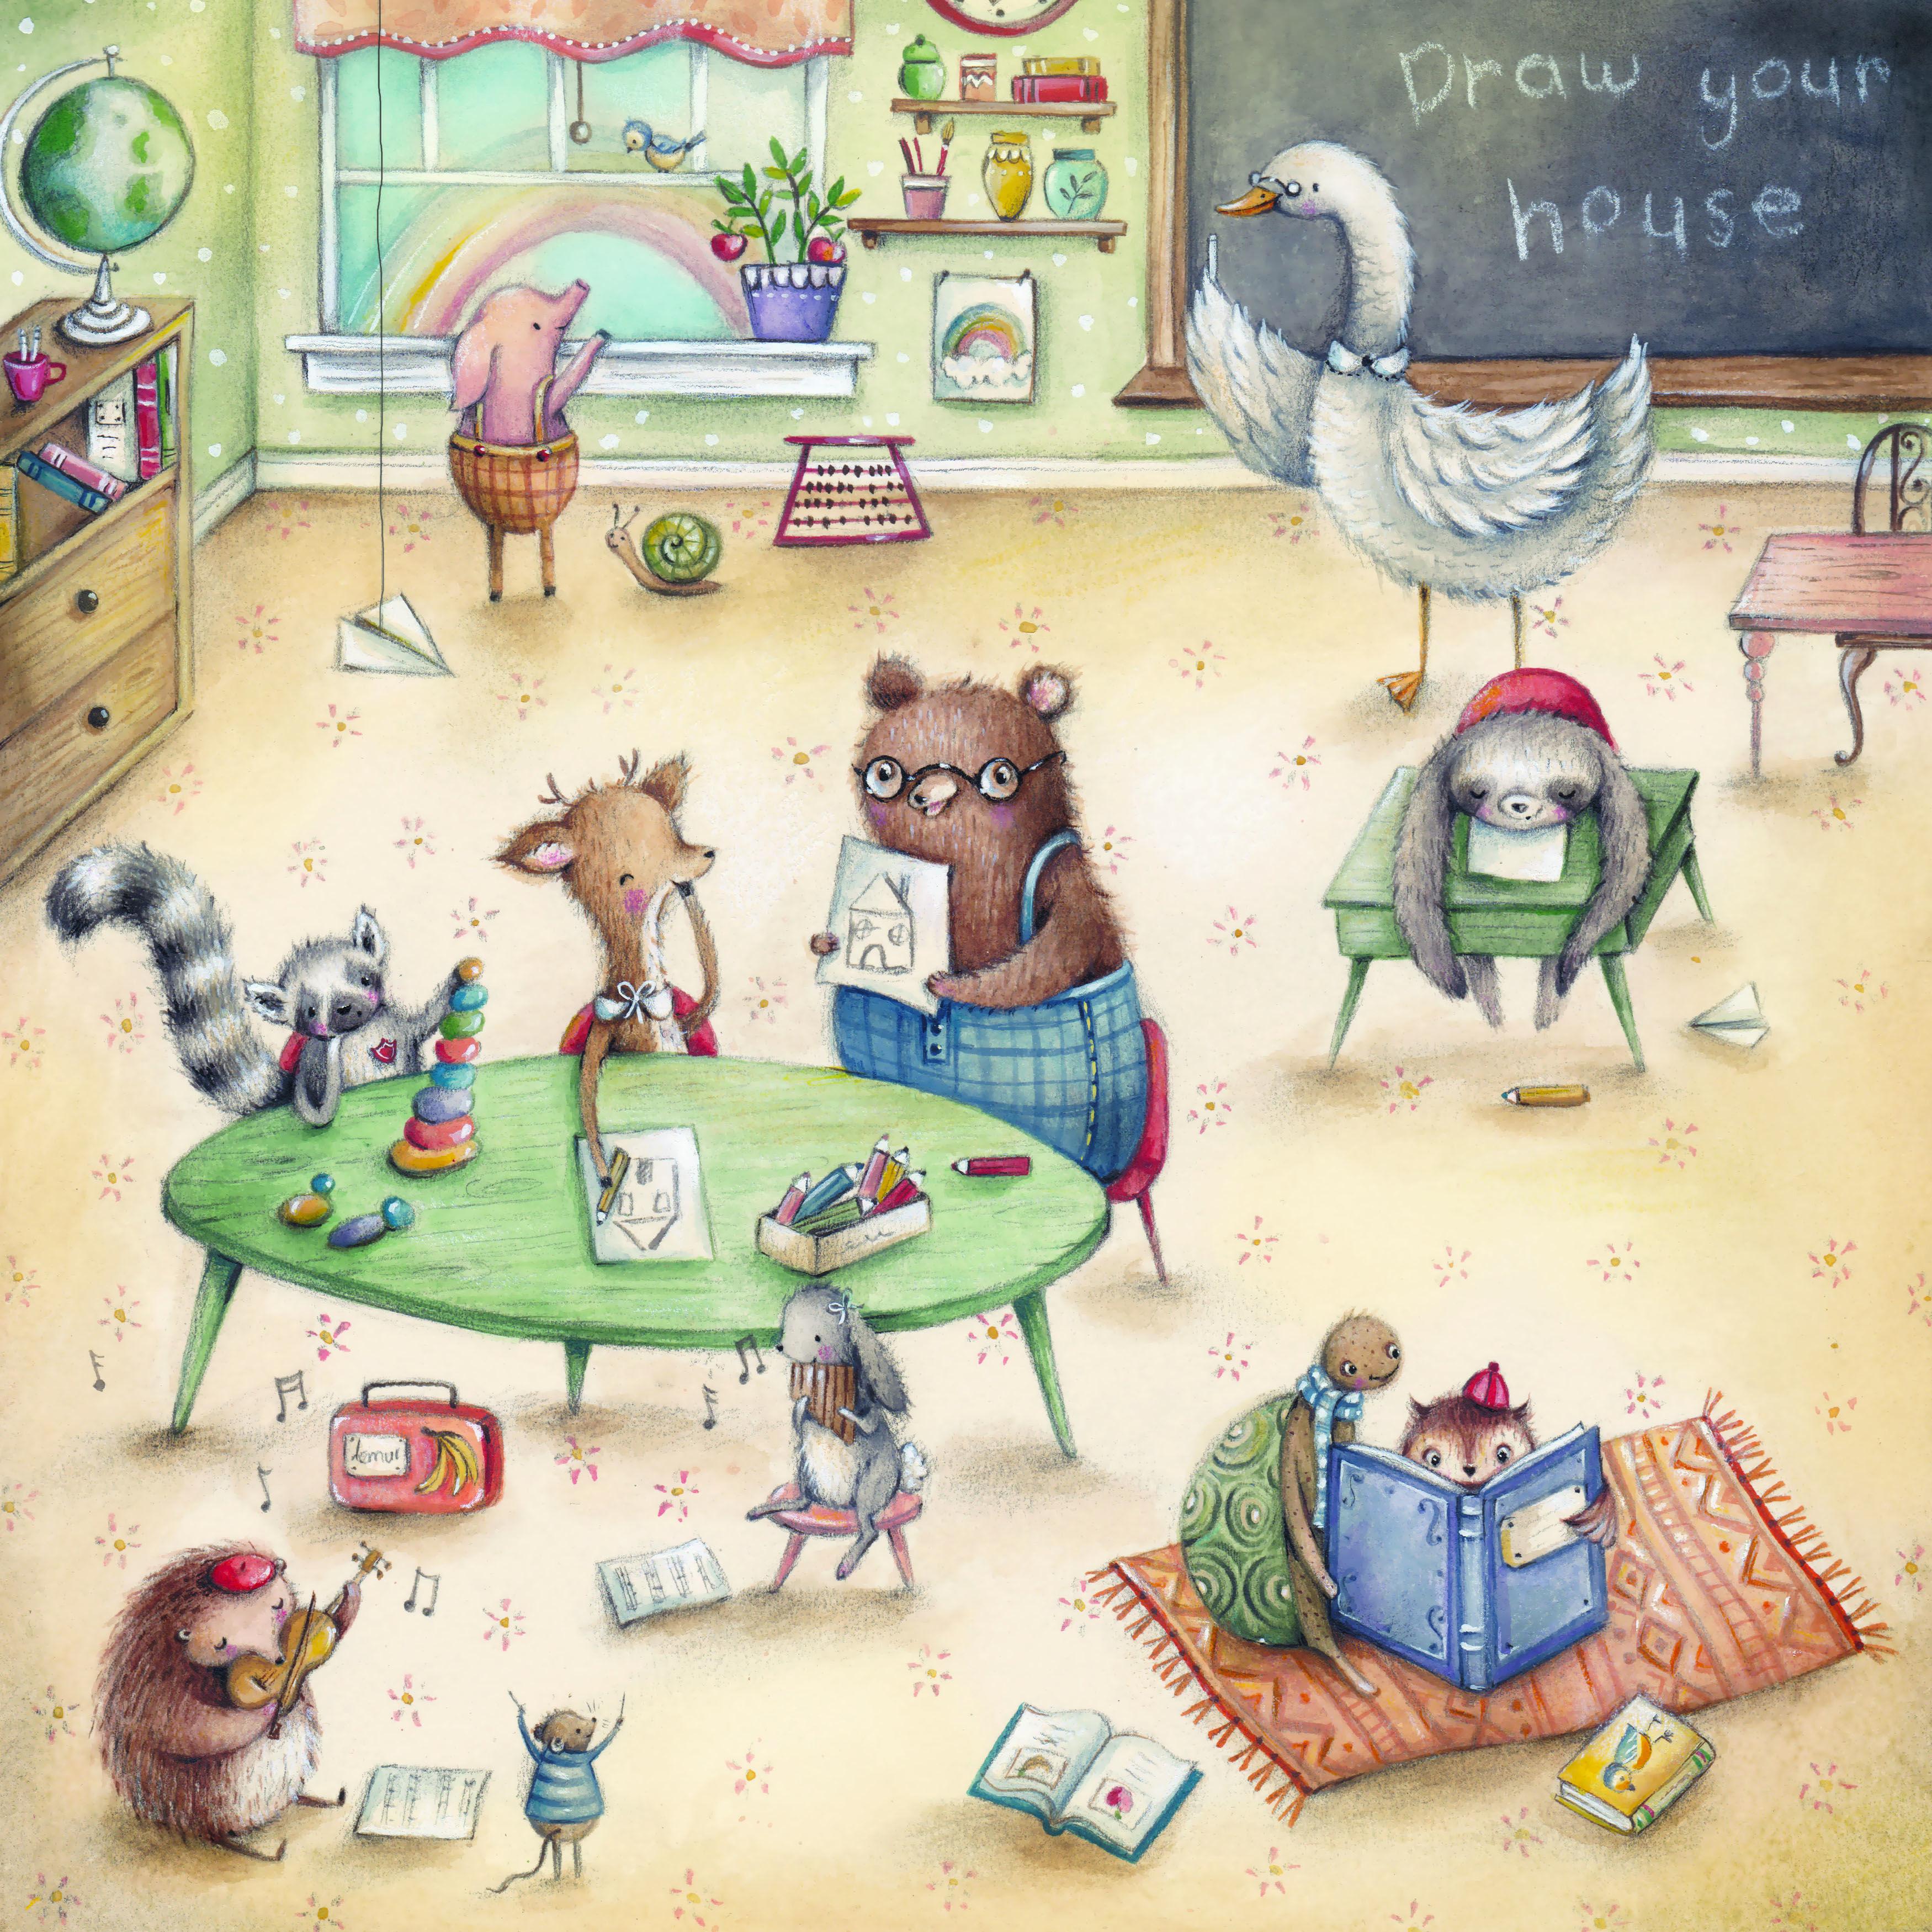 Animal Illustration Watercolour Classroom Storybook Children Book Childrens Illustration Childrens Books Illustrations Childrens Illustrations Illustration Art